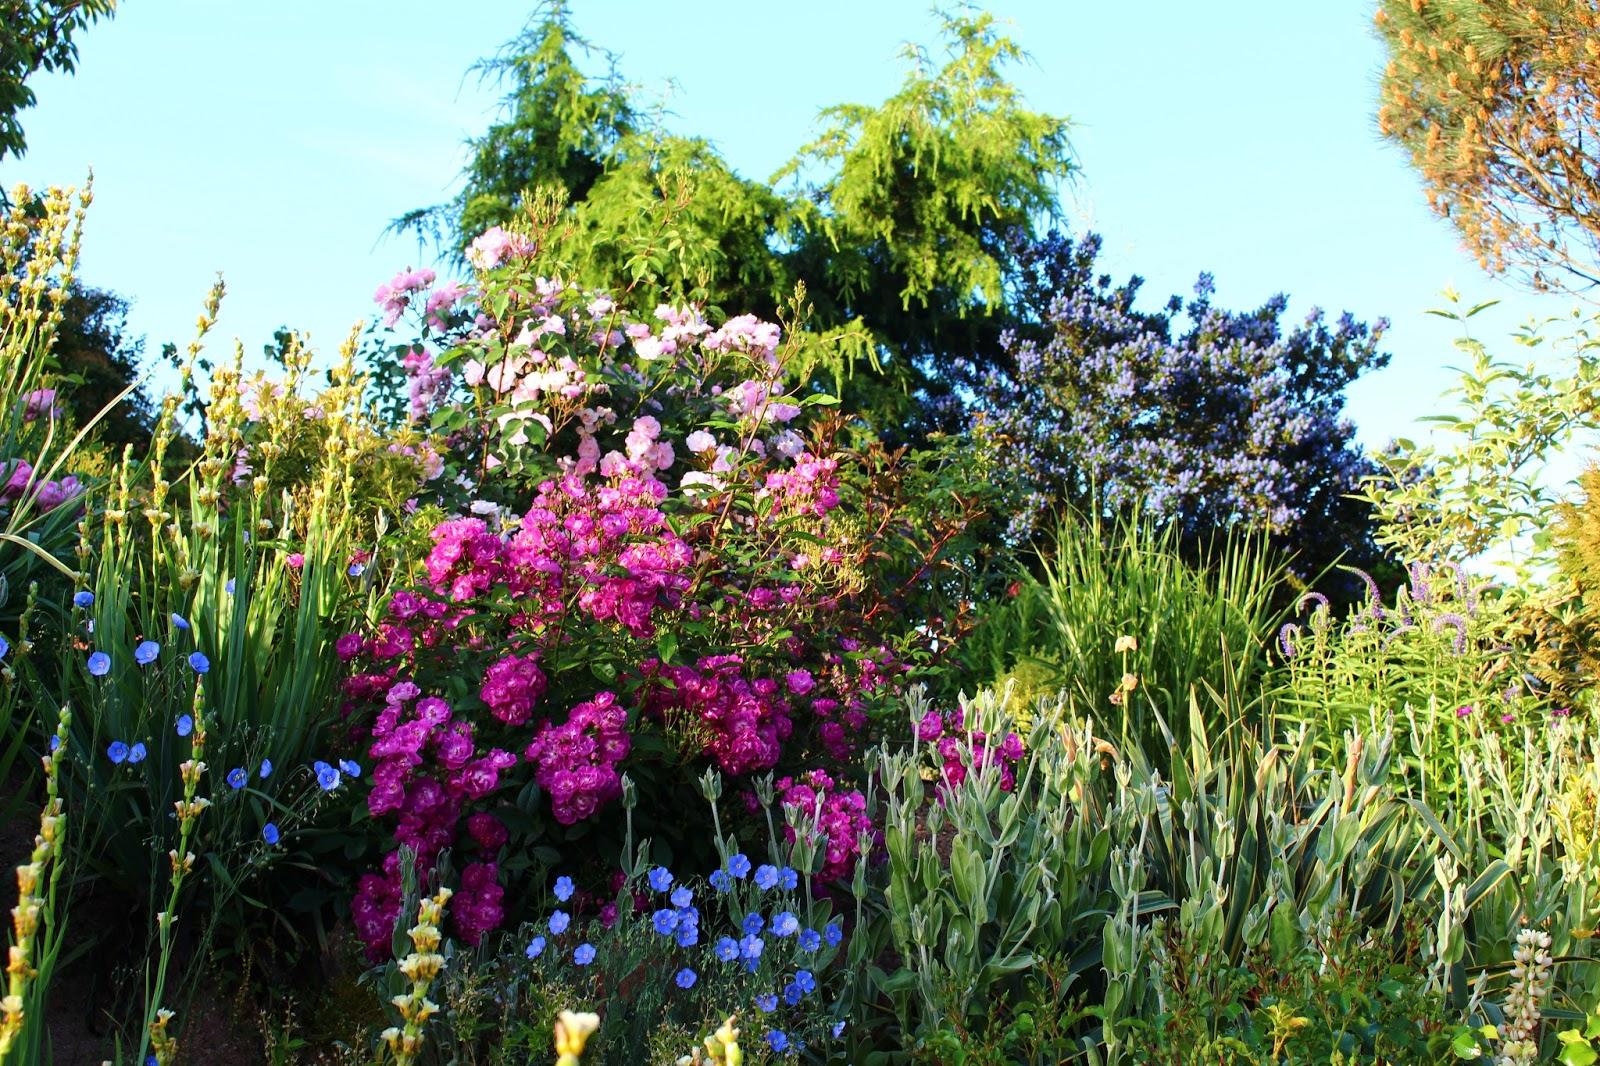 roses du jardin ch neland un petit rosier charmant. Black Bedroom Furniture Sets. Home Design Ideas